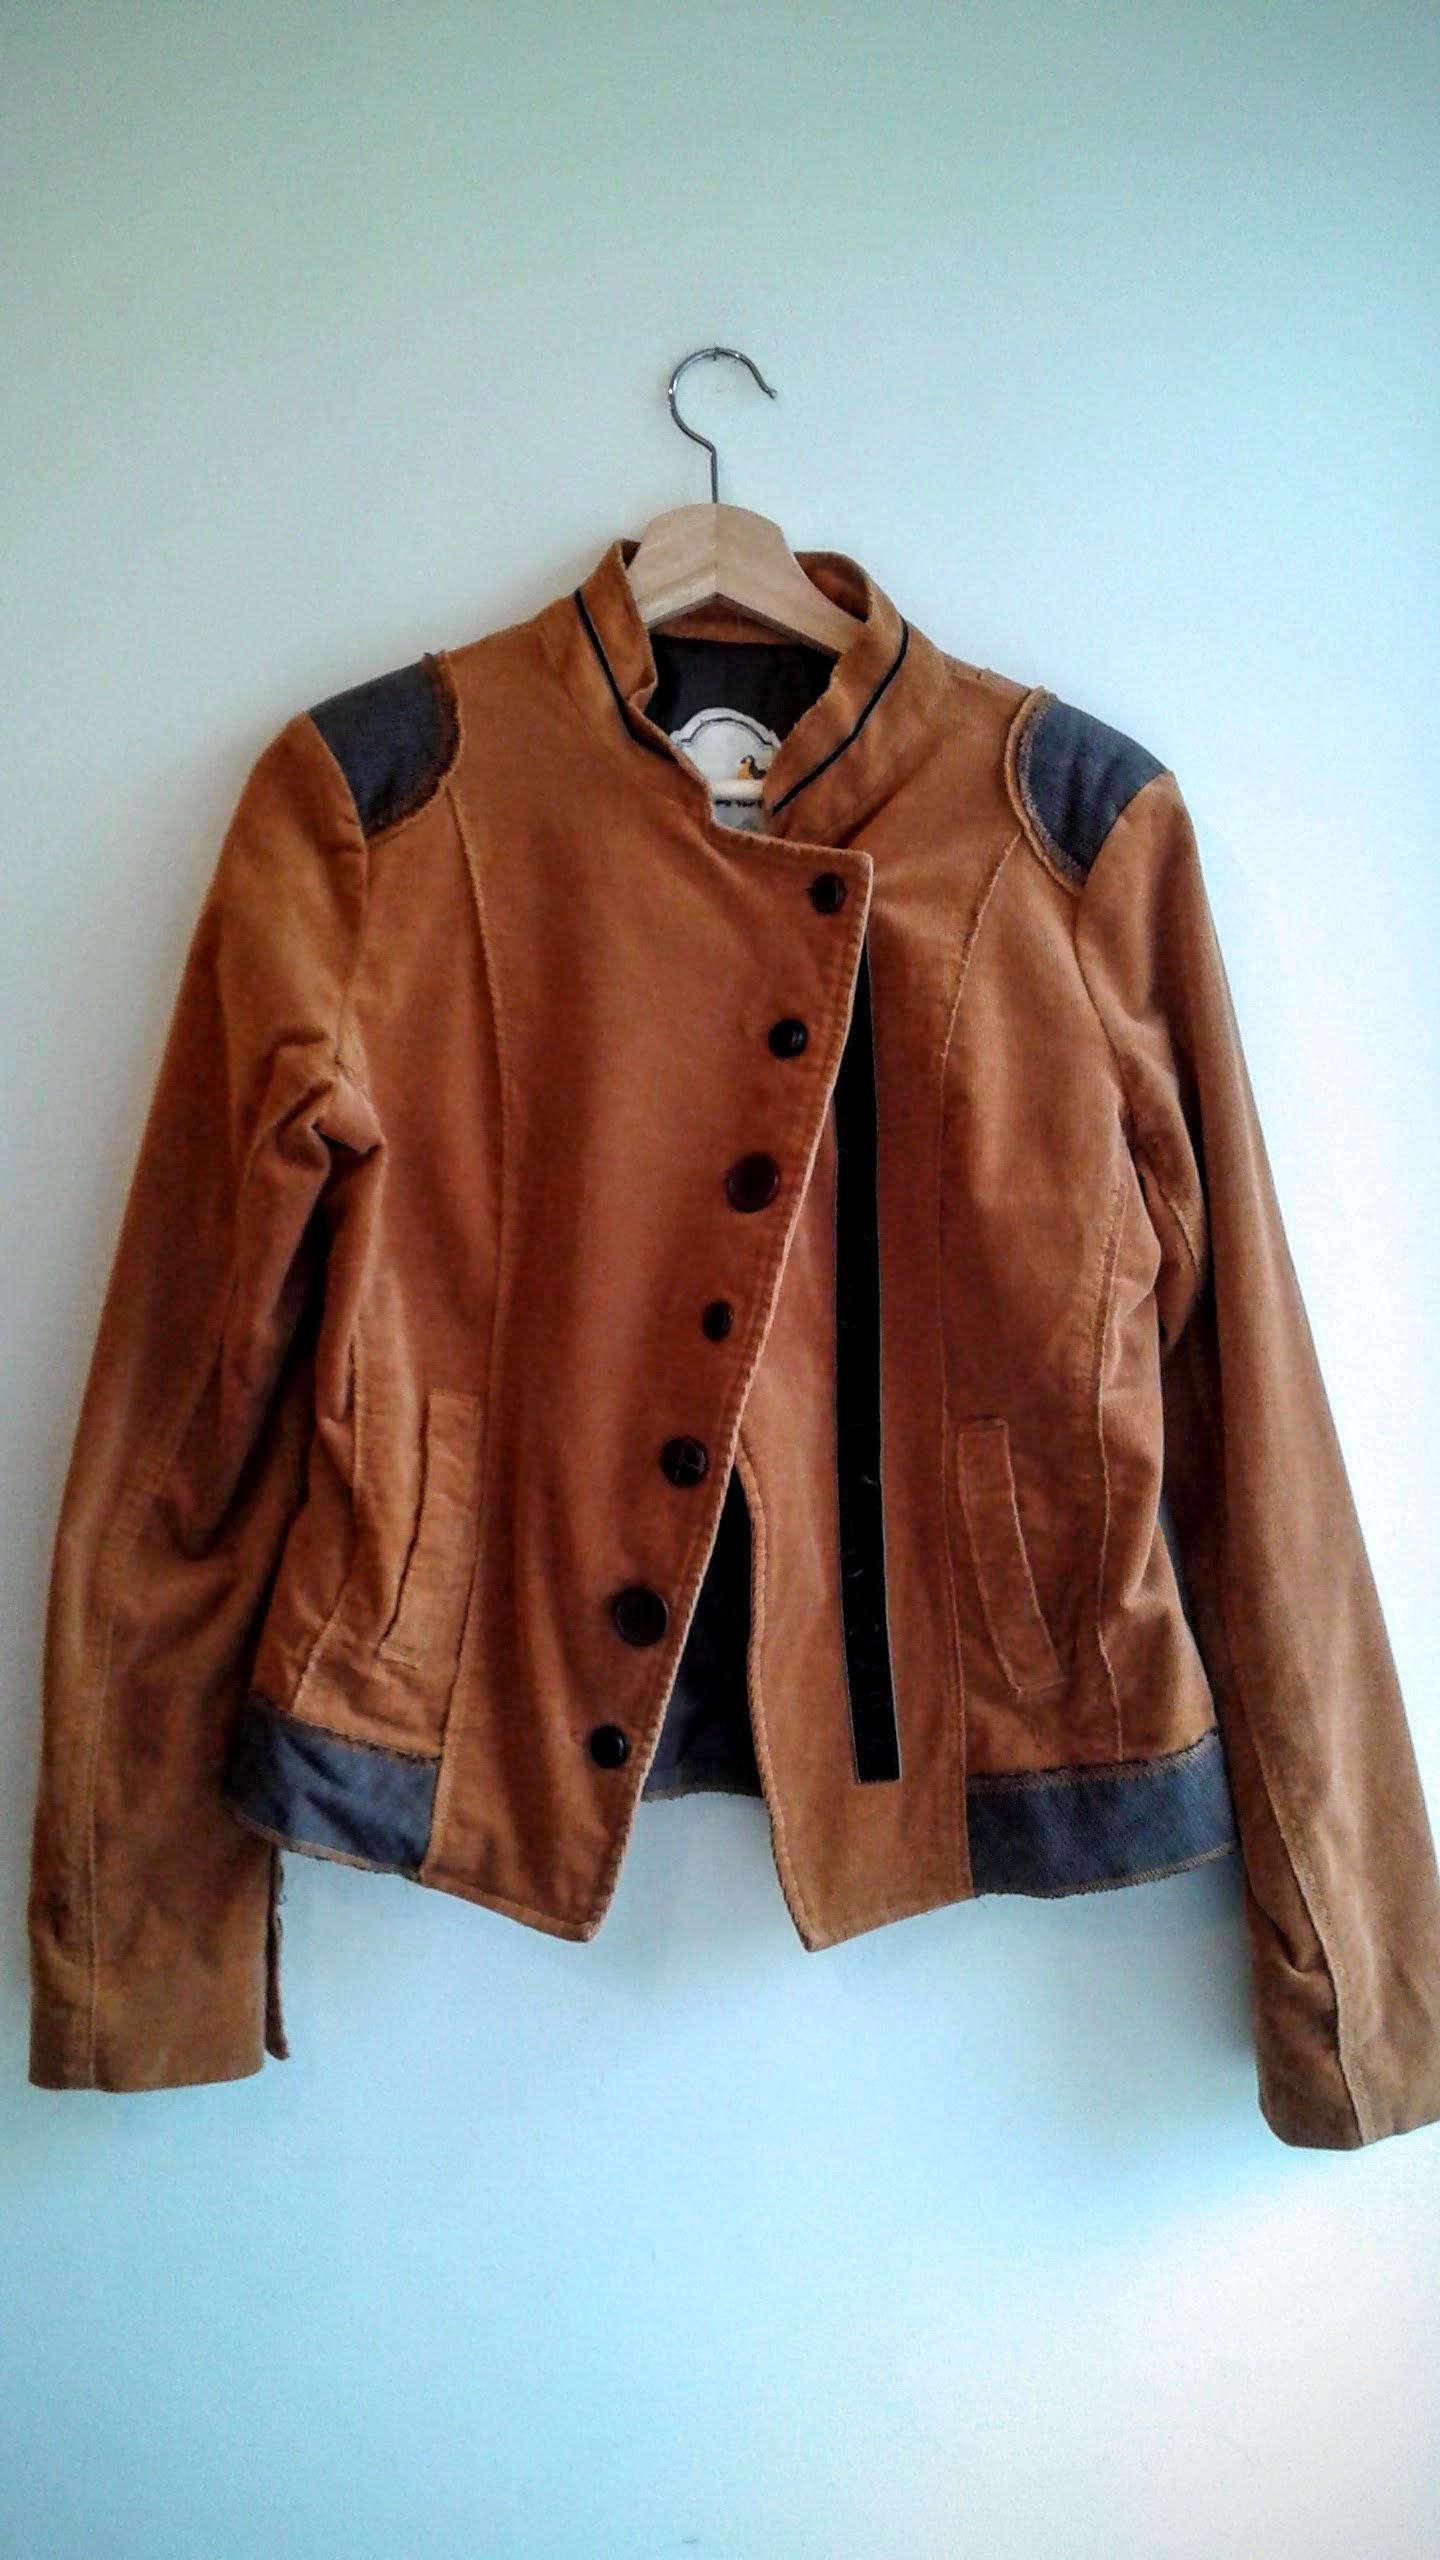 Nick and Mo jacket; Size M, $26